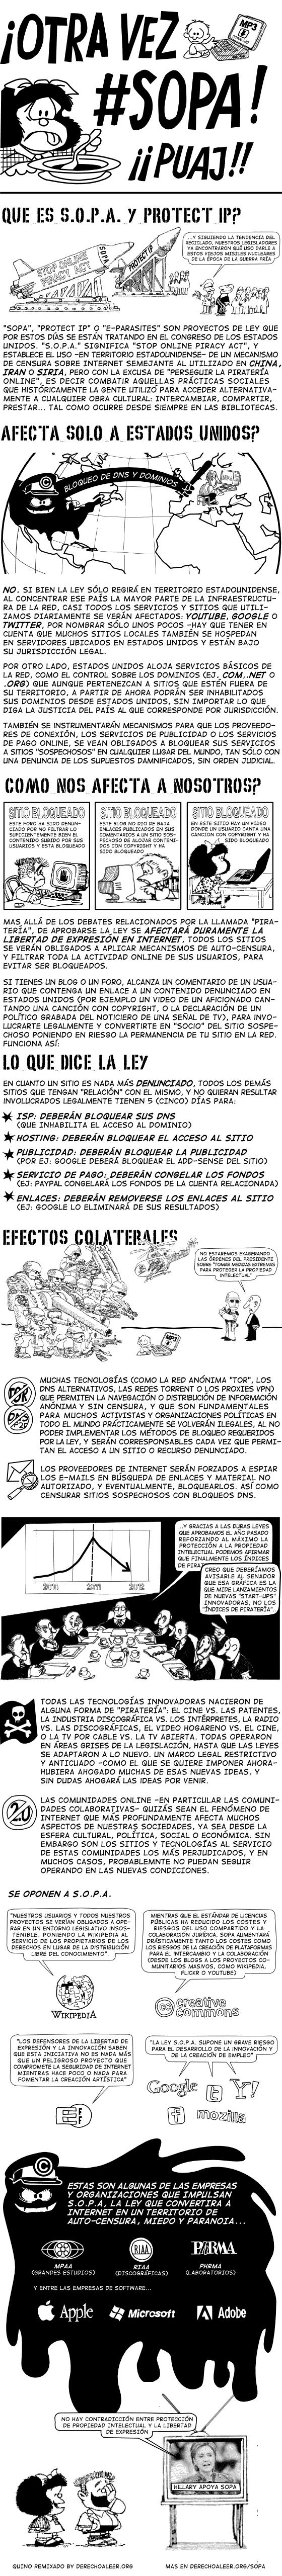 Mafalda explica Ley SOPA